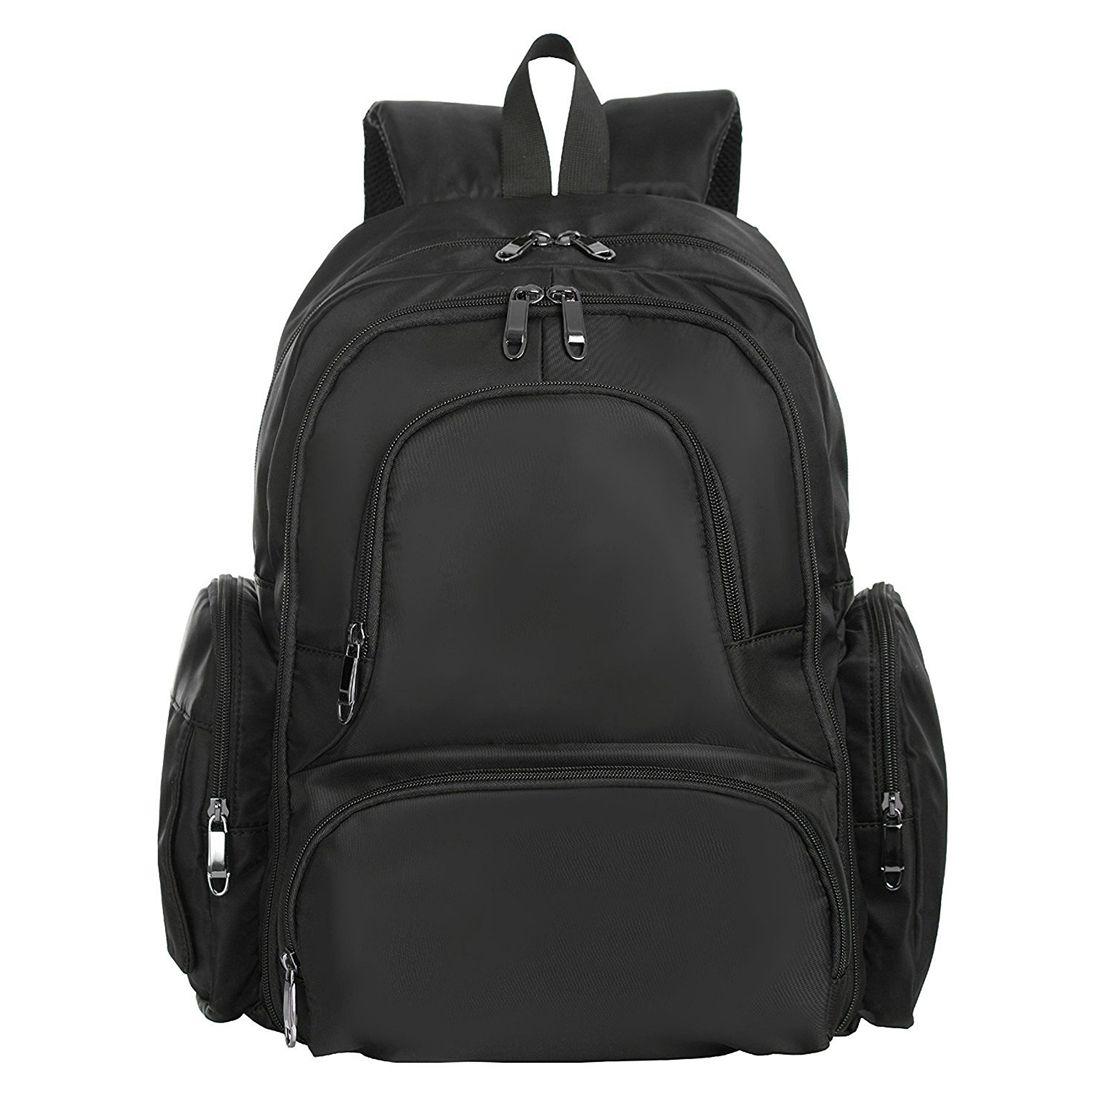 3-Piece Baby Diaper Bag Mummy Bag Multi-functional Fashionable Pregnant Maternity Bag Trolley Hang Bag